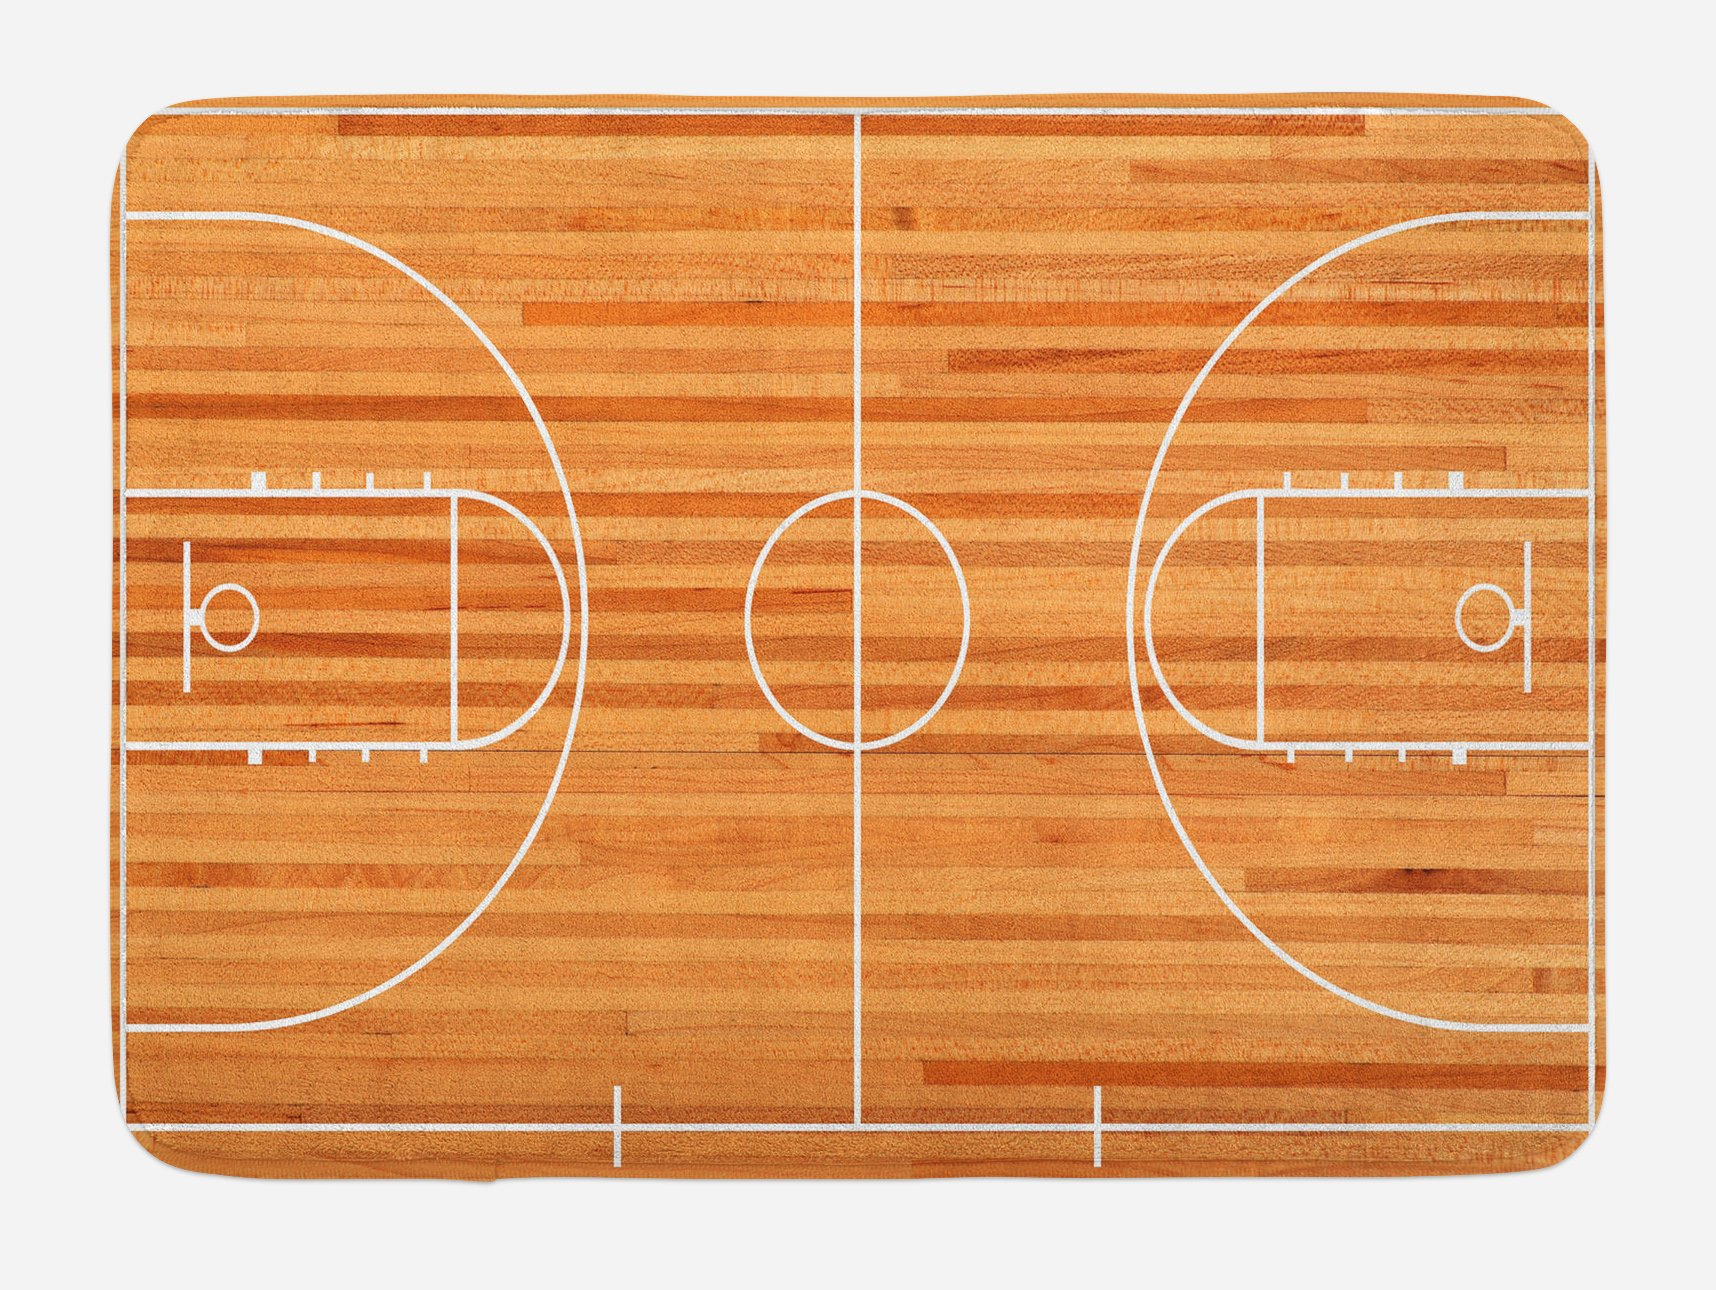 Lunarable Boy's Room Bath Mat, Standard Floor Plan on Parquet Backdrop Basketball Court Playground Print, Plush Bathroom Decor Mat with Non Slip Backing, 29.5 W X 17.5 W Inches, Pale Brown White